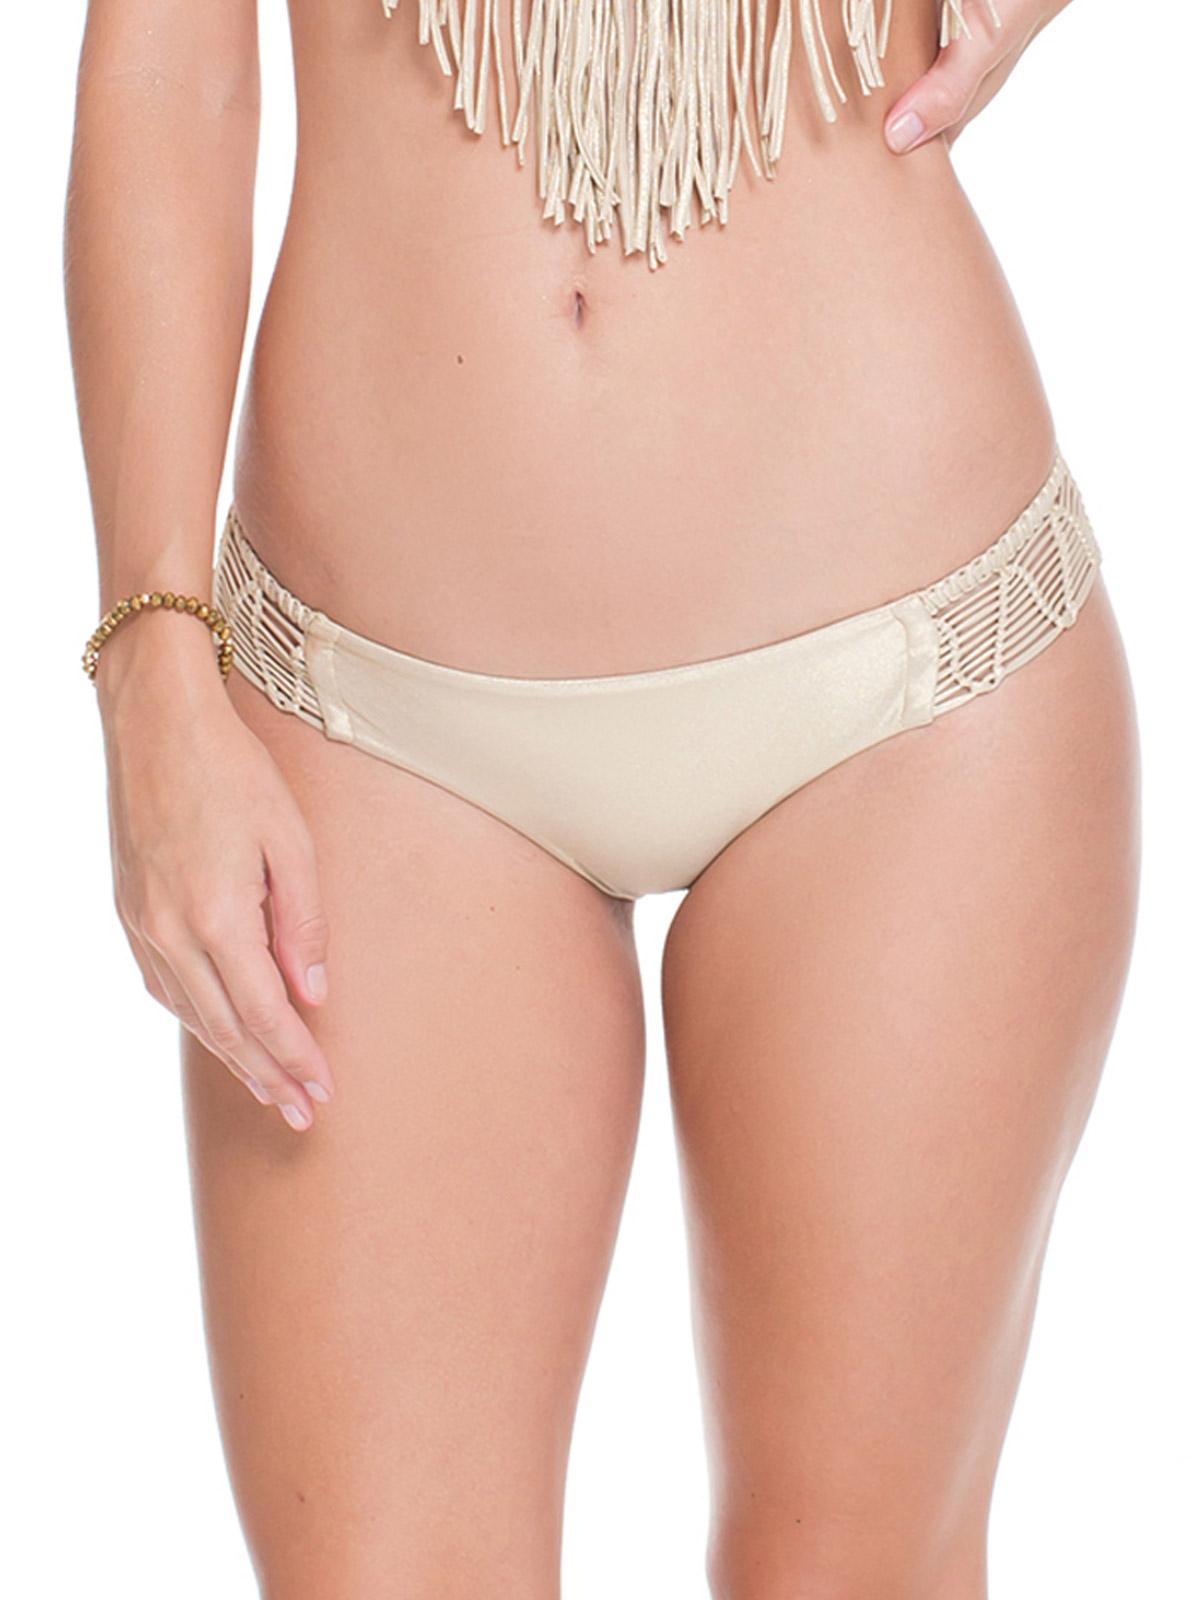 gold satin finish fixed bikini slip with macramé detail - calcinha iris